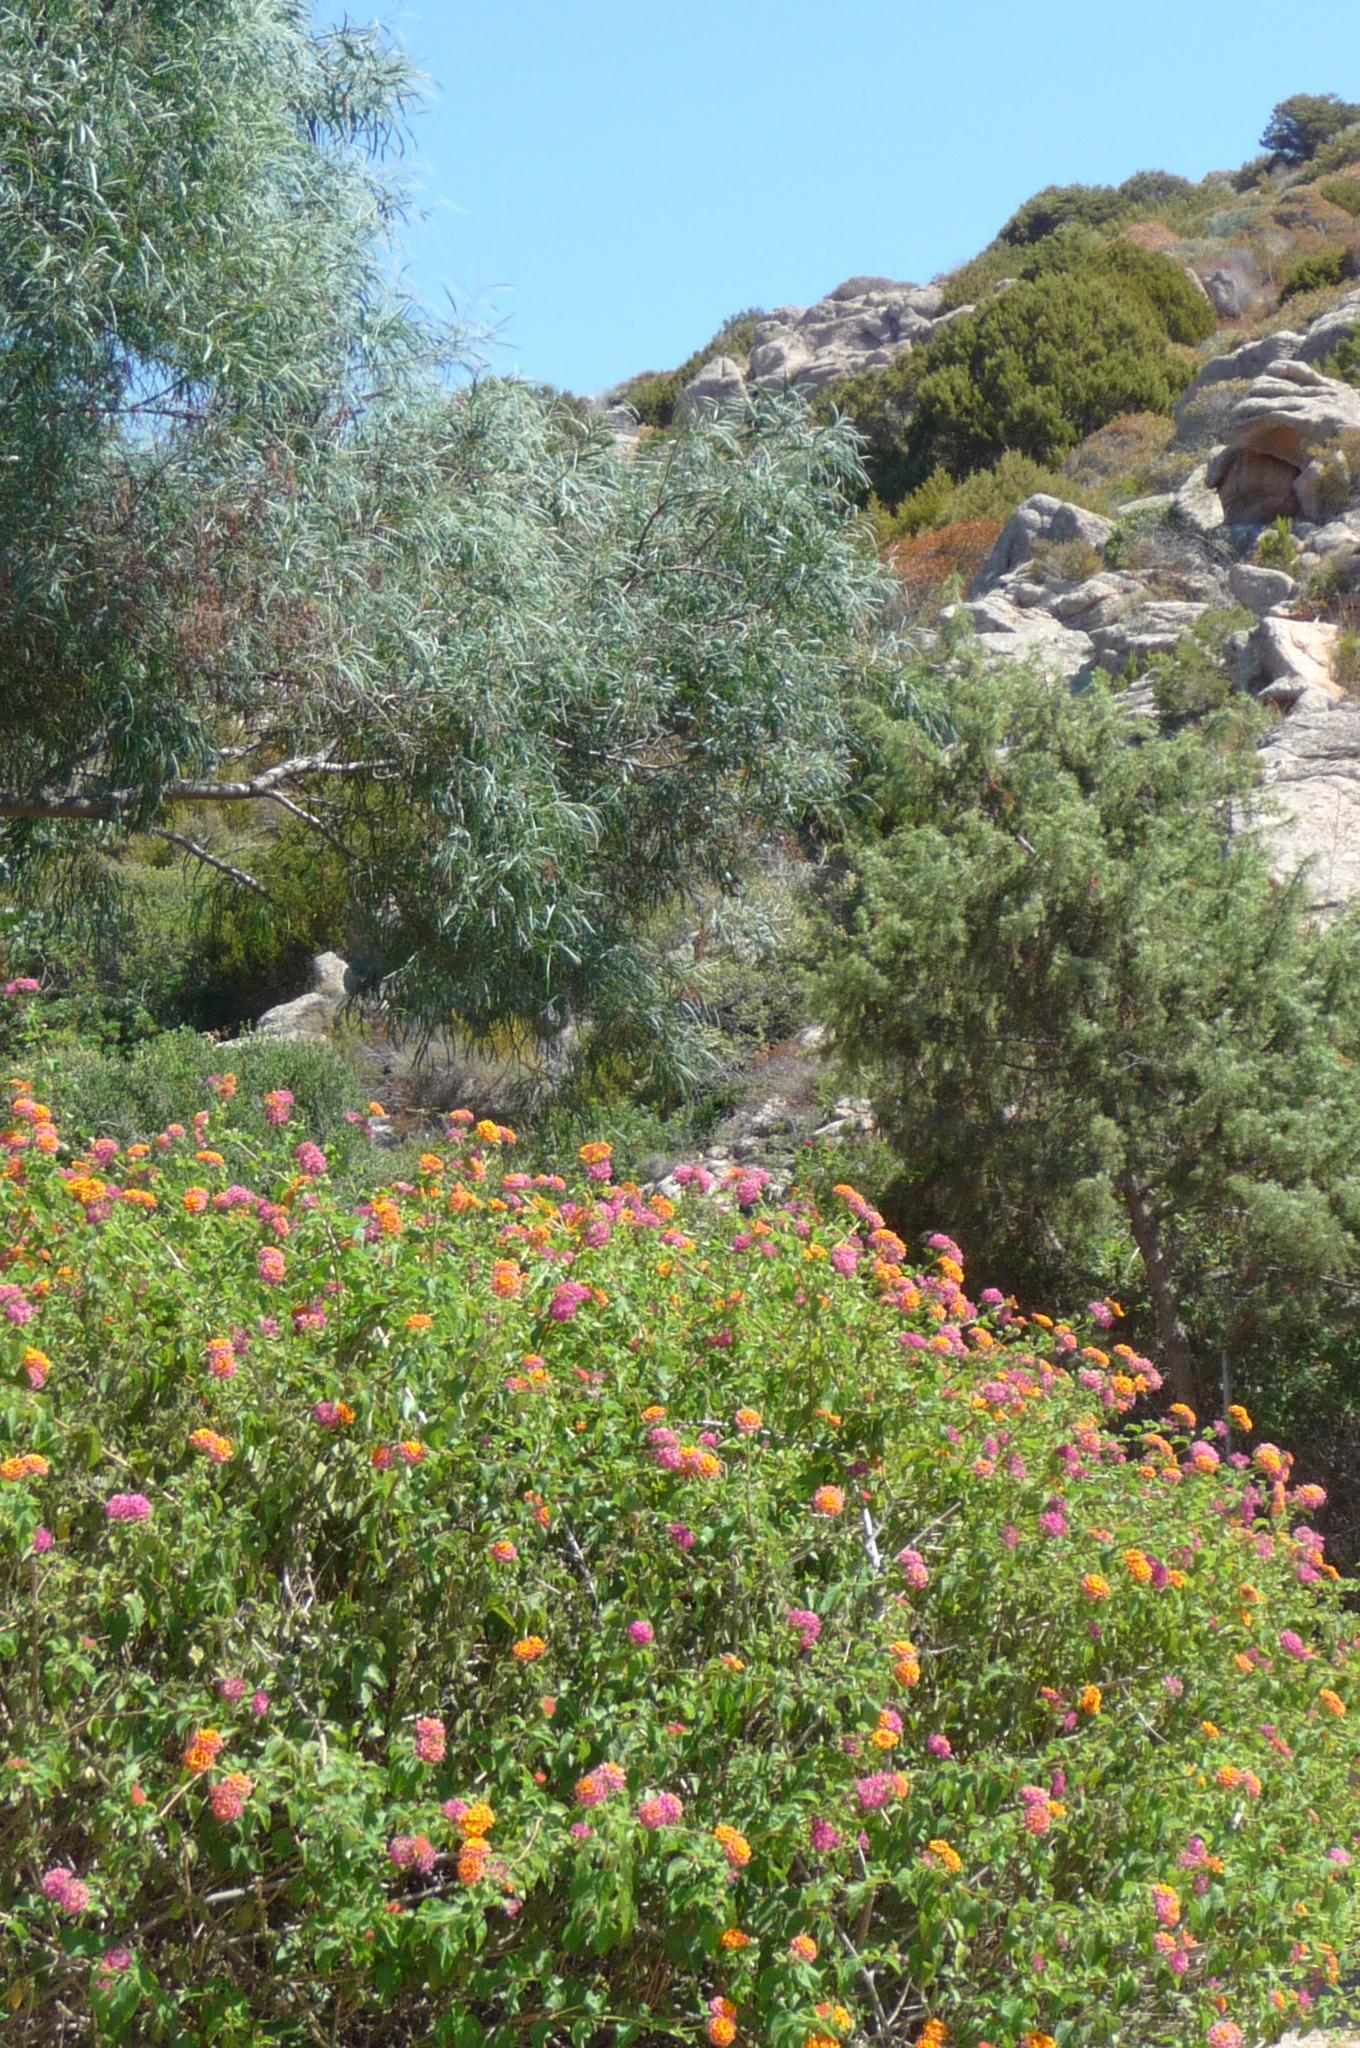 Ferienwohnung Cottage-Apartment On The Coast Surrounded By Unspoilt Nature (2230692), Canneddi, Olbia-Tempio, Sardinien, Italien, Bild 13